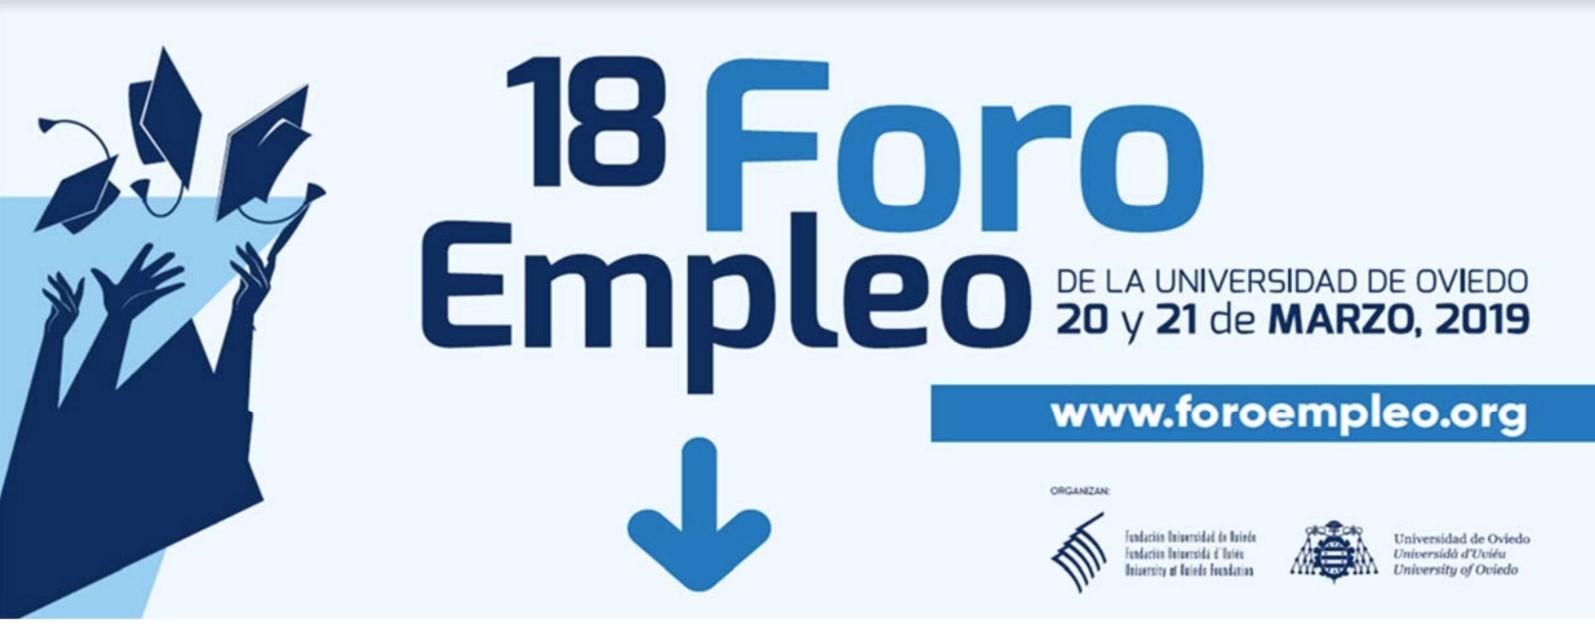 Discover the #ForoEmpleoUniovi